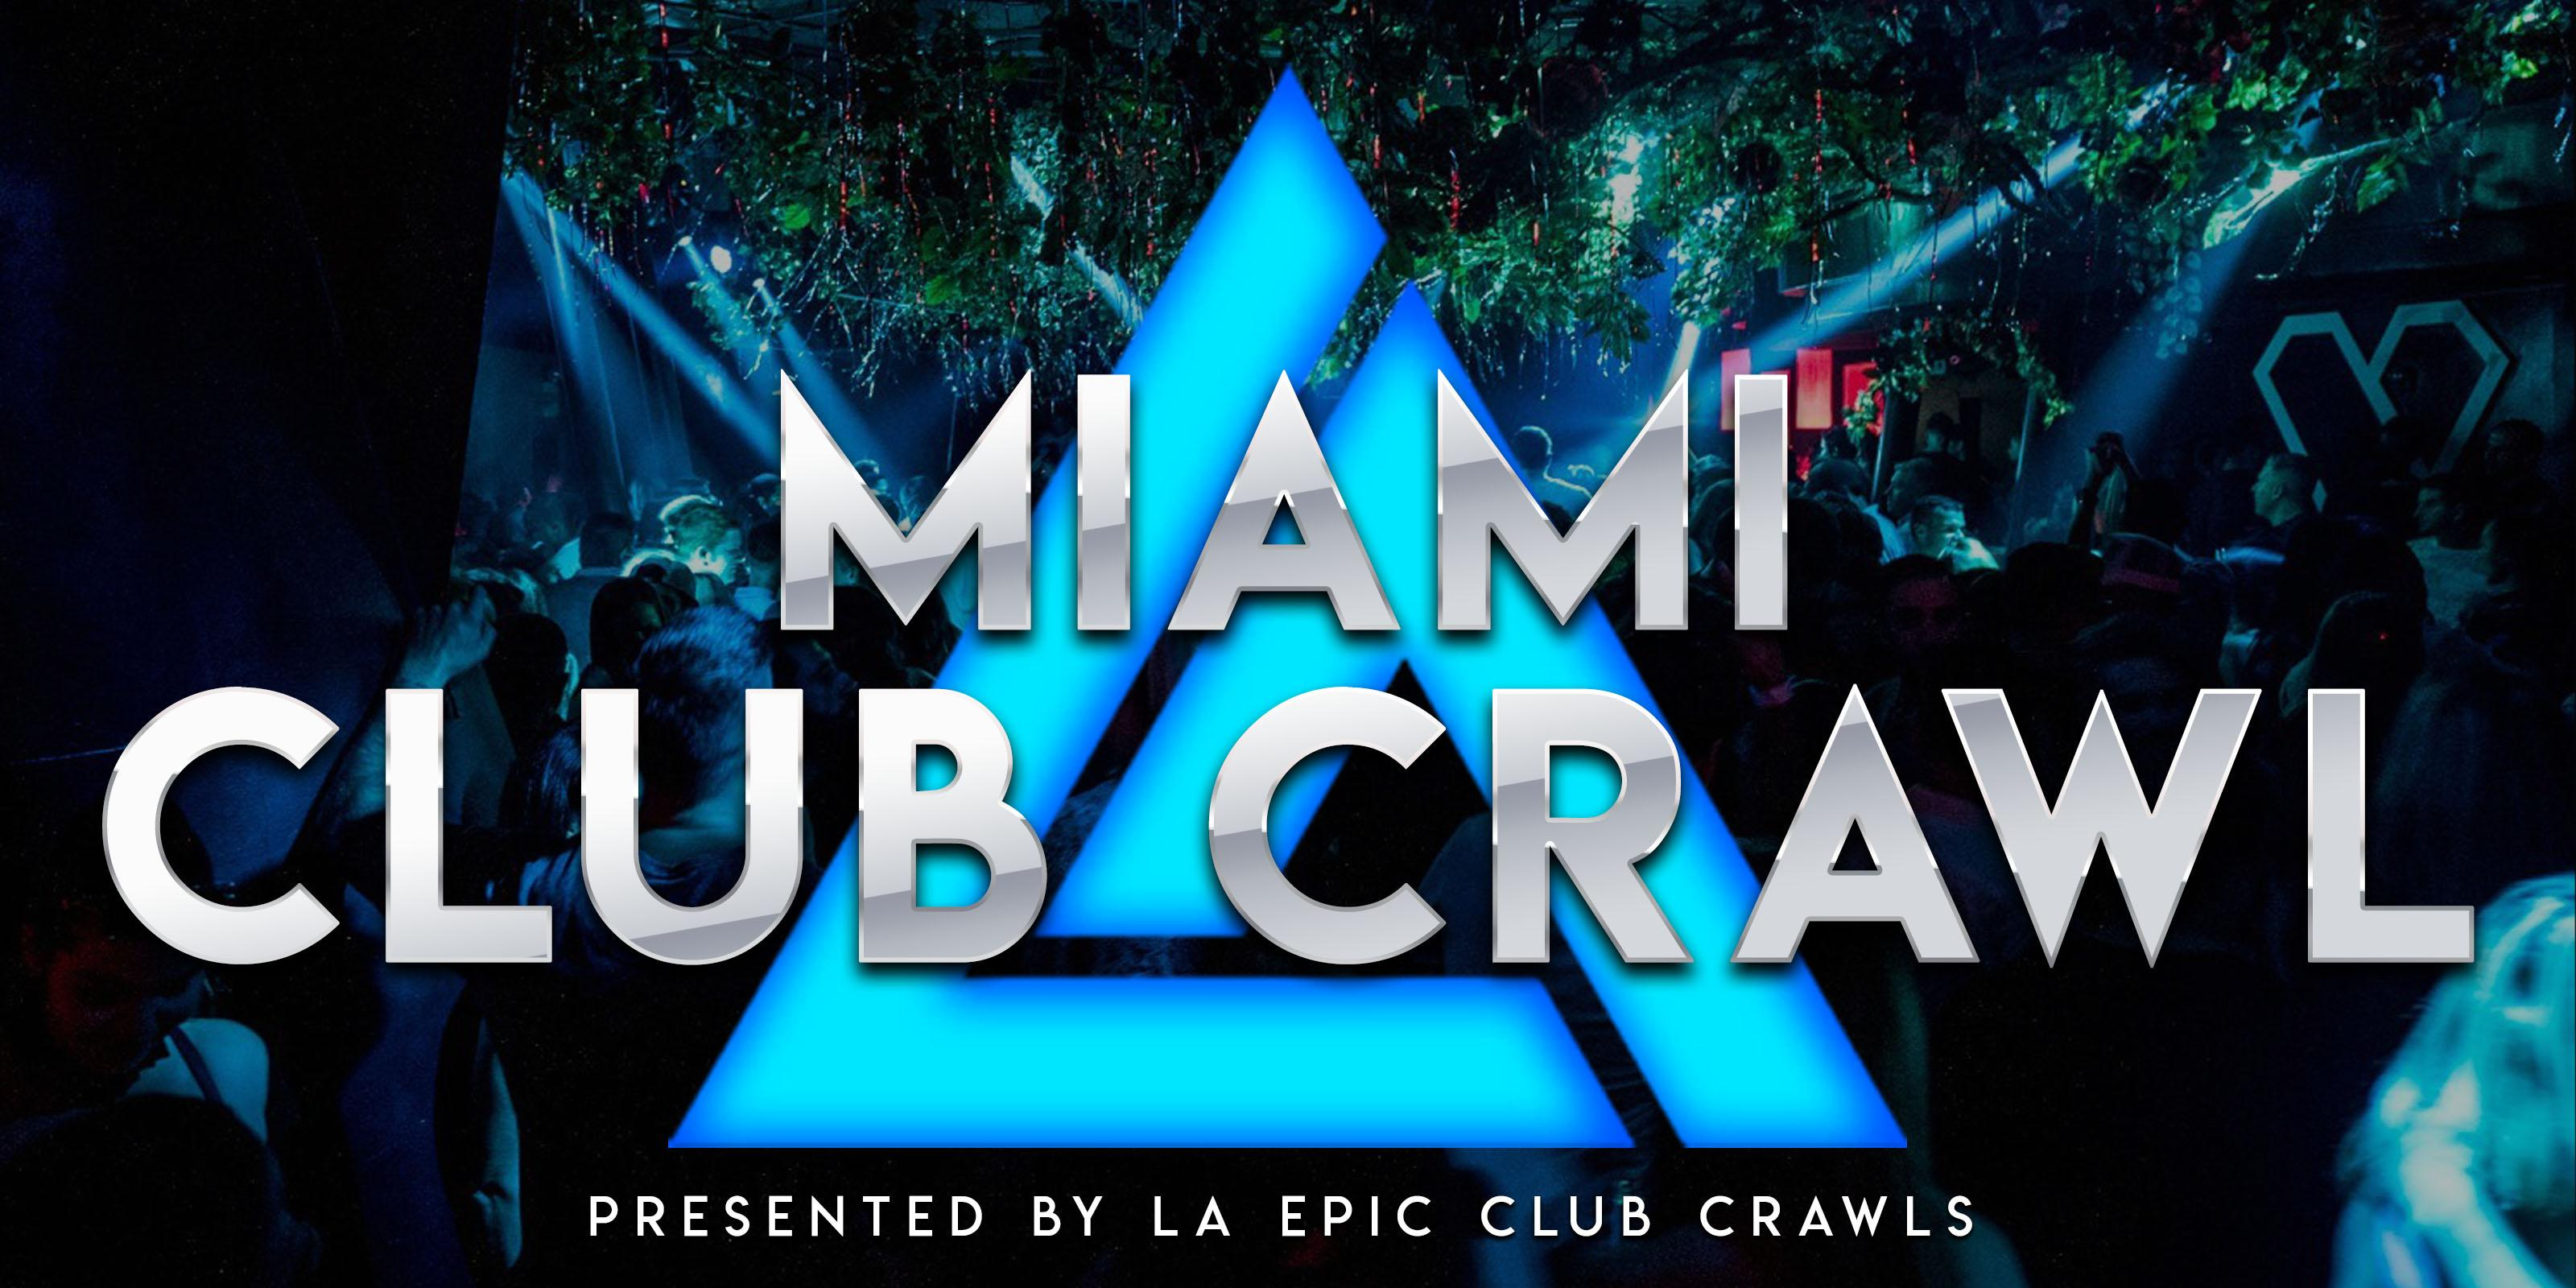 Miami Club Crawl